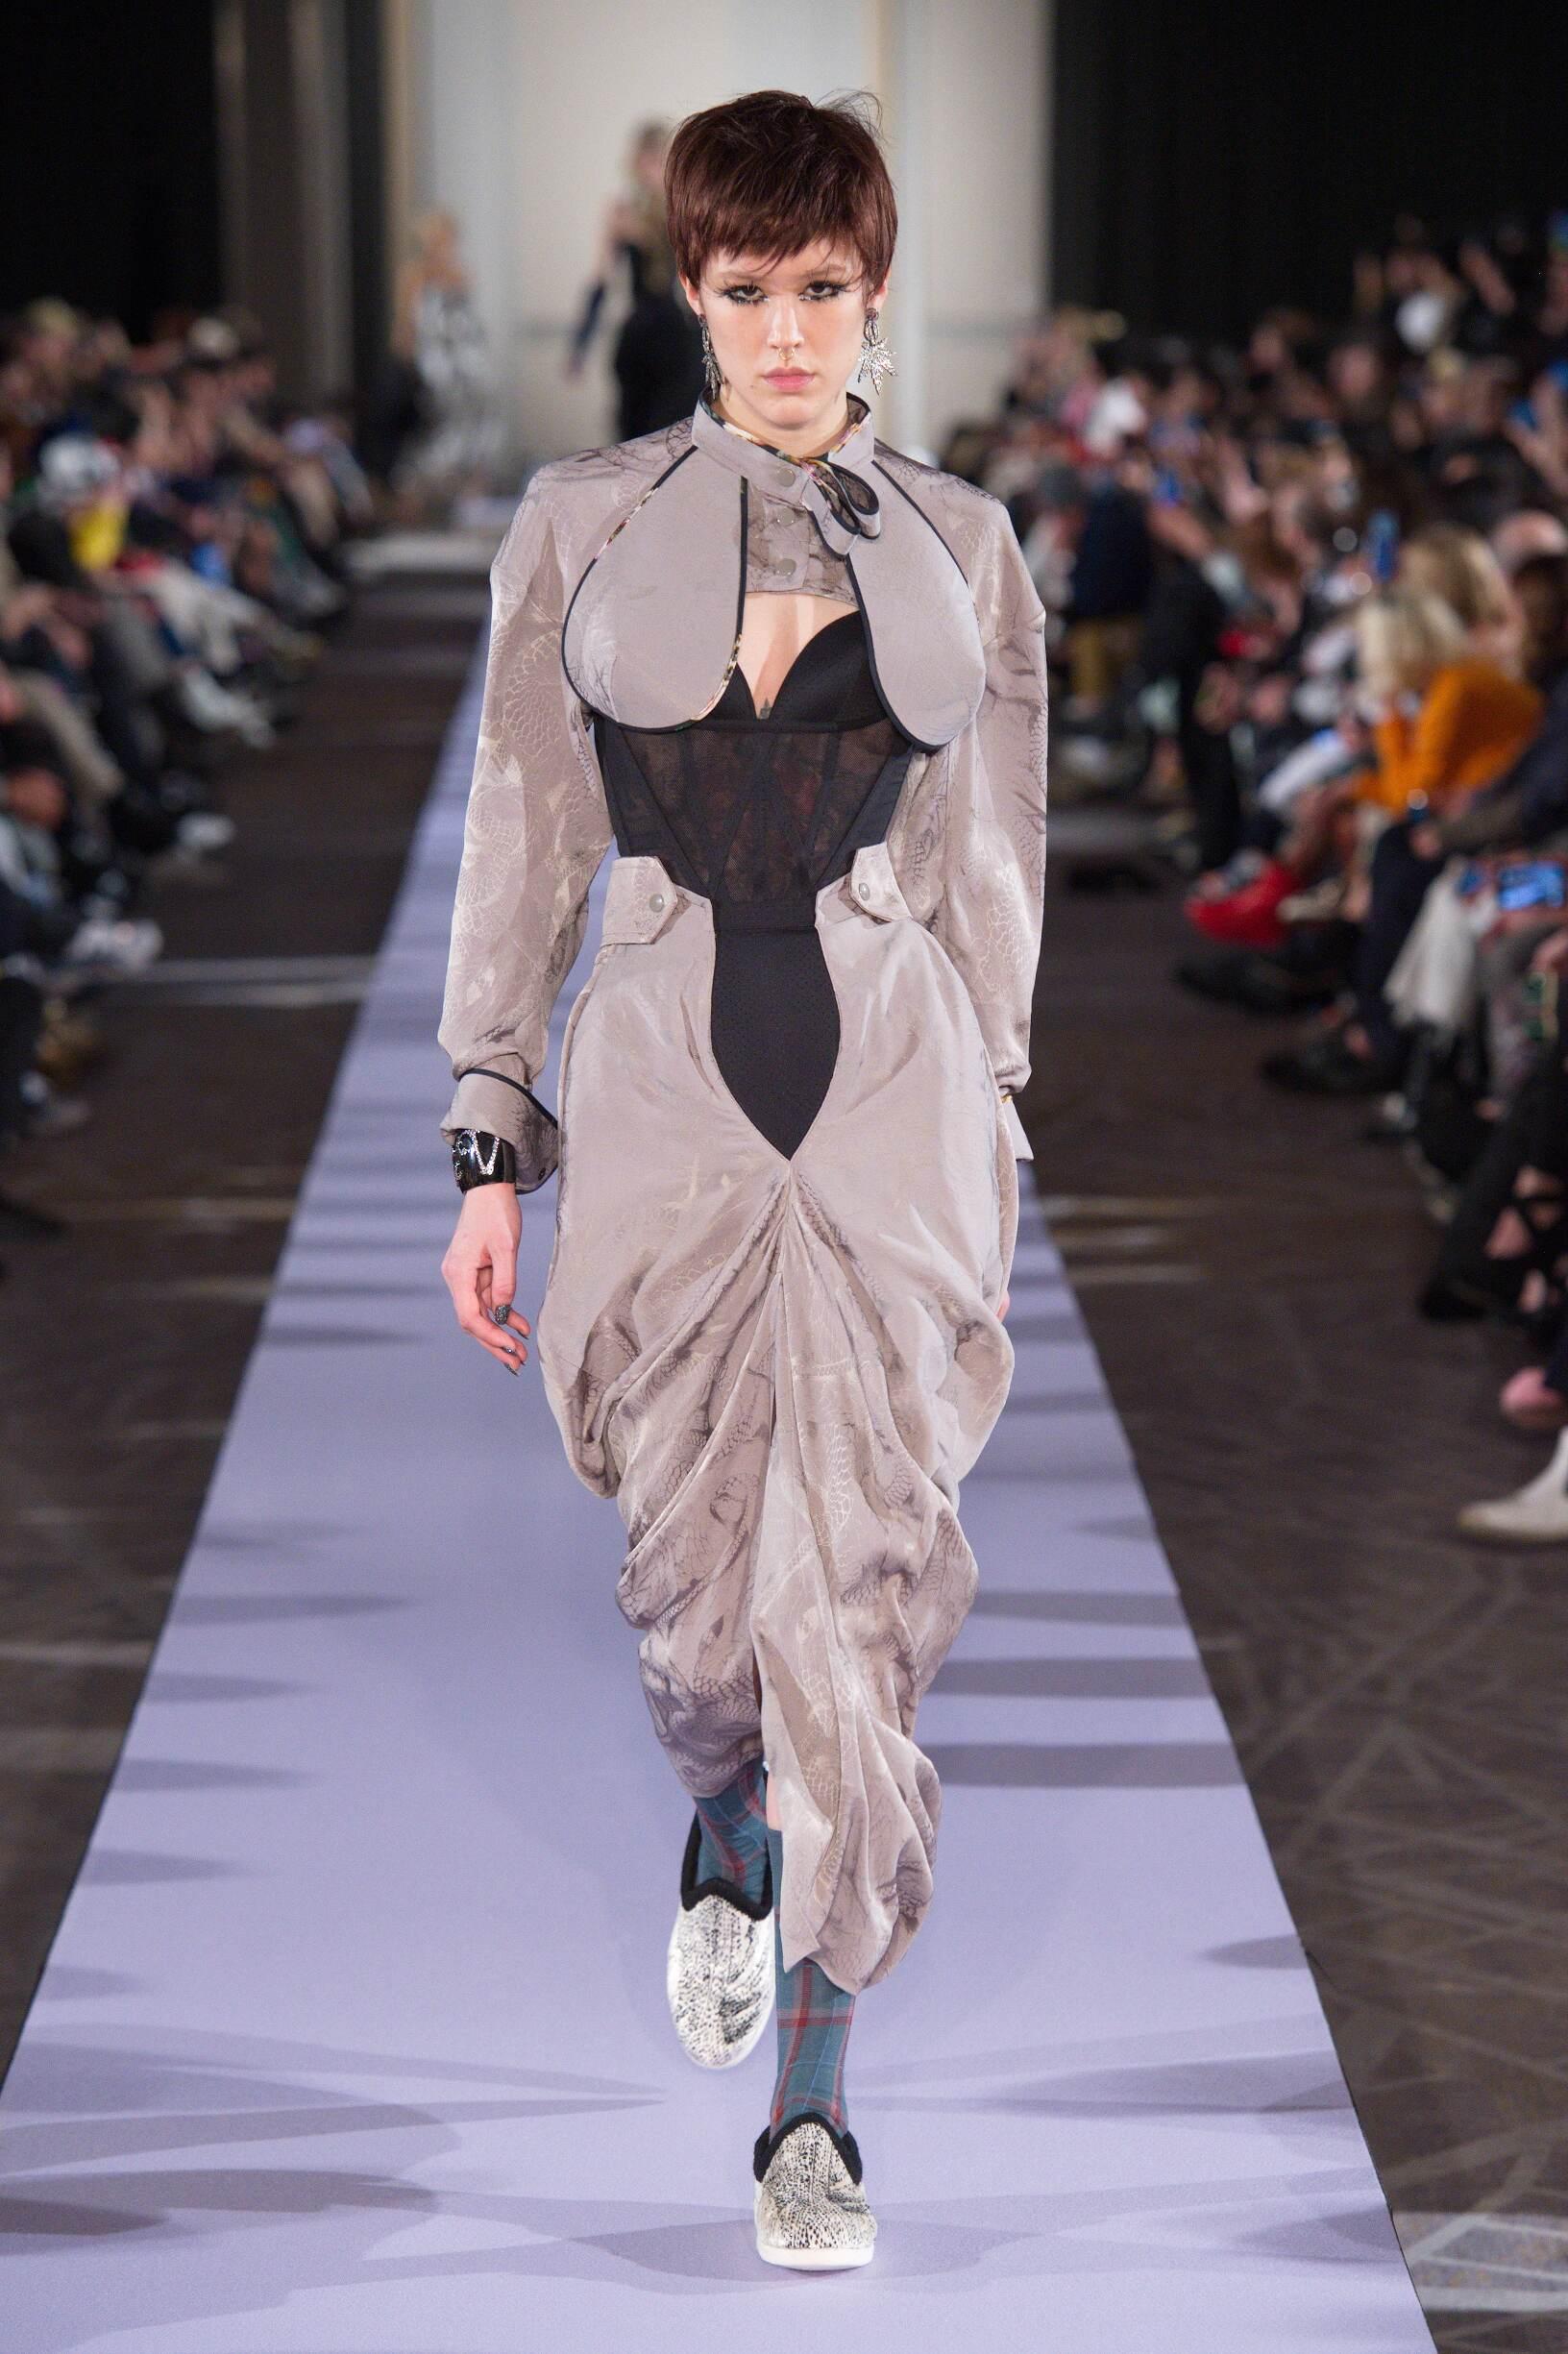 Woman FW 2019 Andreas Kronthaler for Vivienne Westwood Show Paris Fashion Week